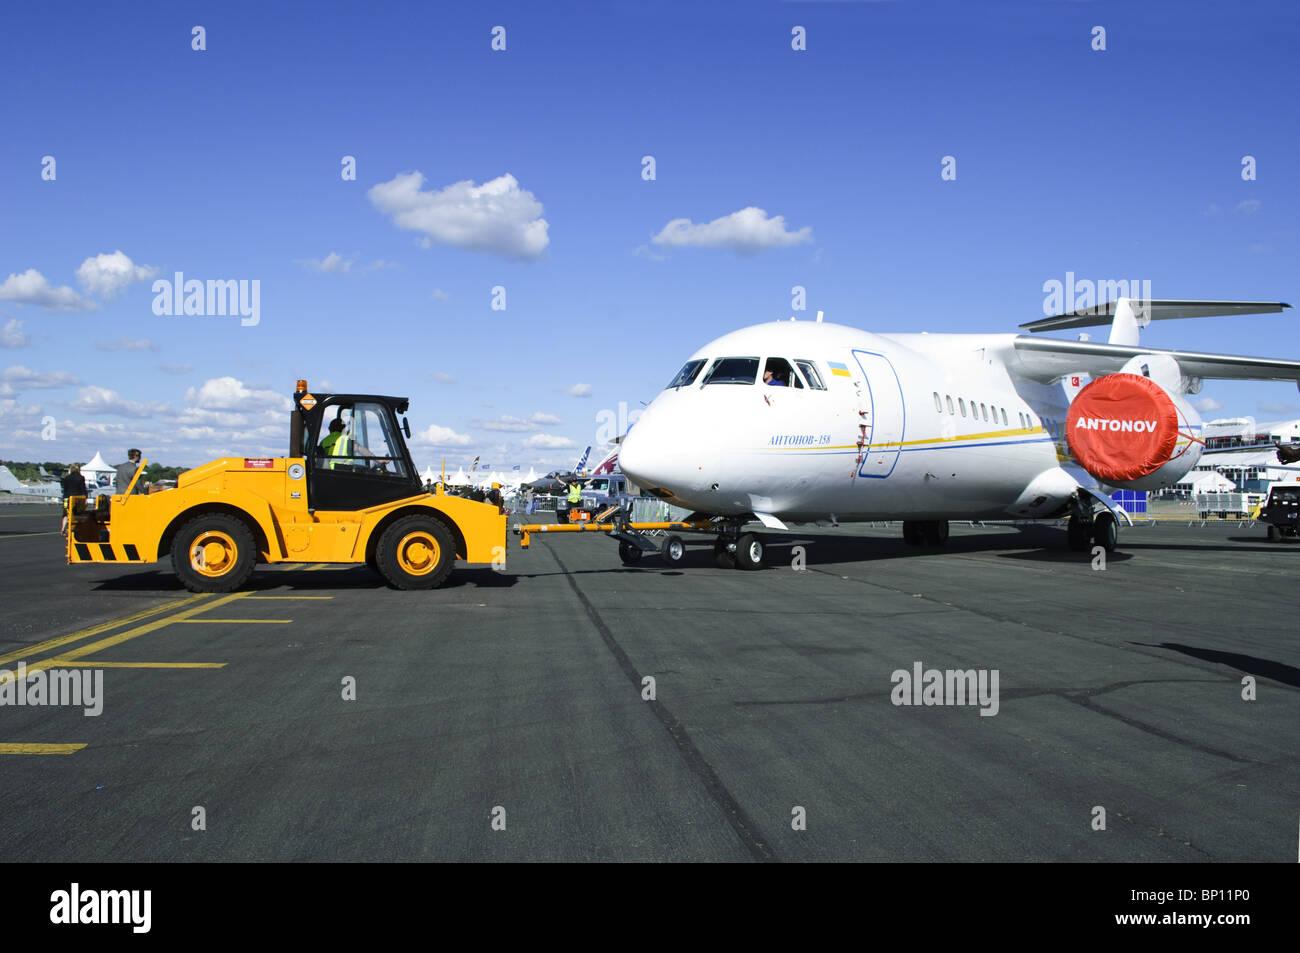 Antonov An-158 on tow at Farnborough Airshow - Stock Image